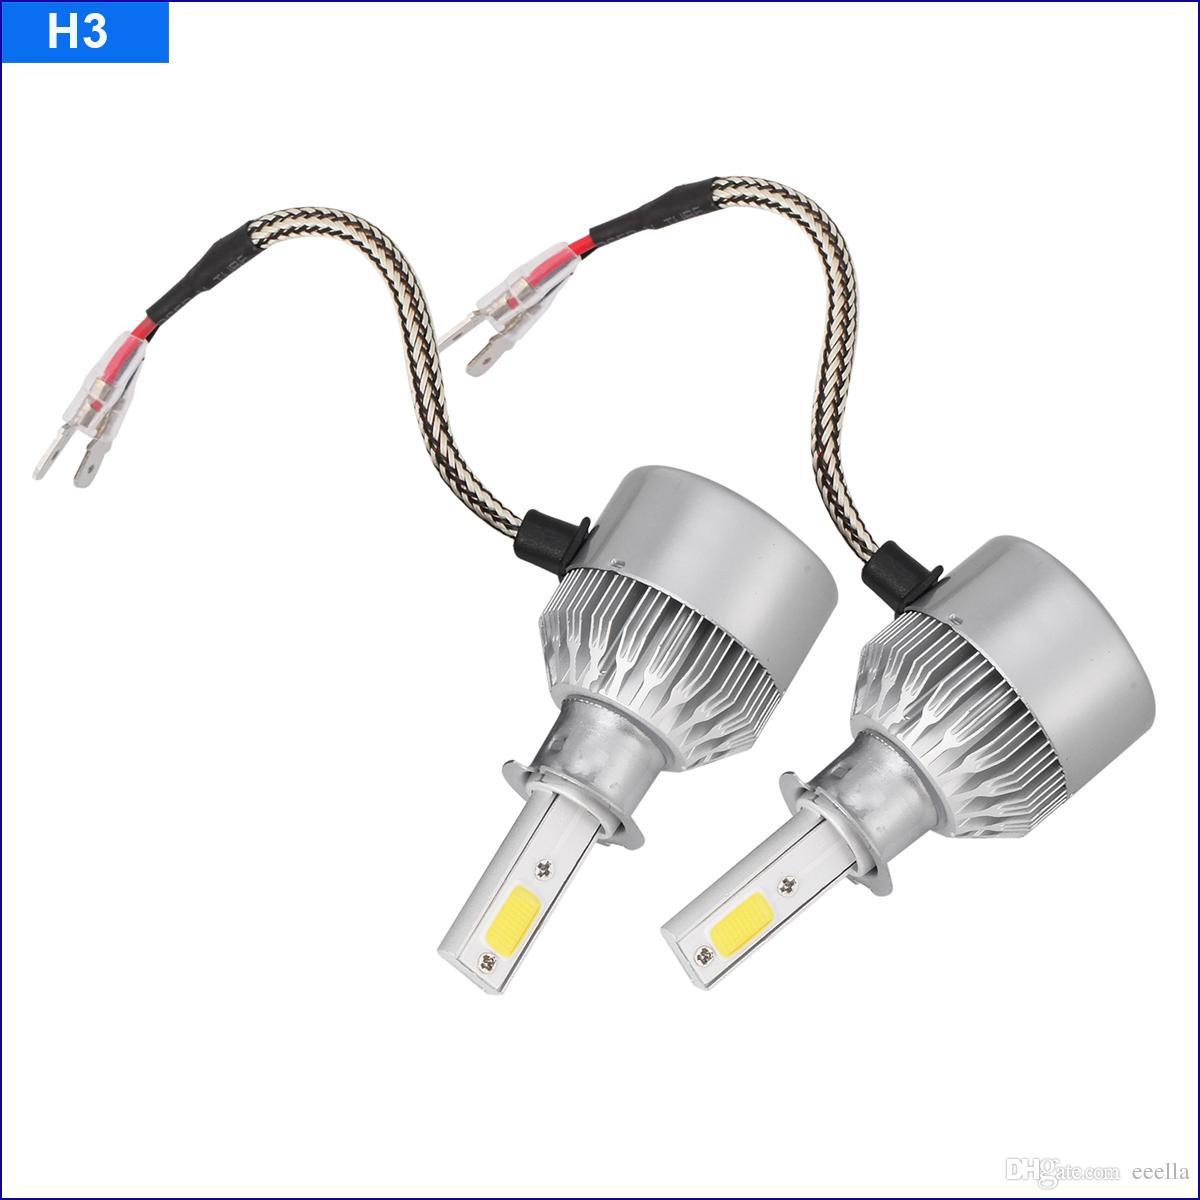 Super Bright 72W 7600LM Car LED Headlight H1 H3 H4 H7 H11 9005 9006 12V 24V Fog DRL Automobiles Headlamp Driving Head LAMP